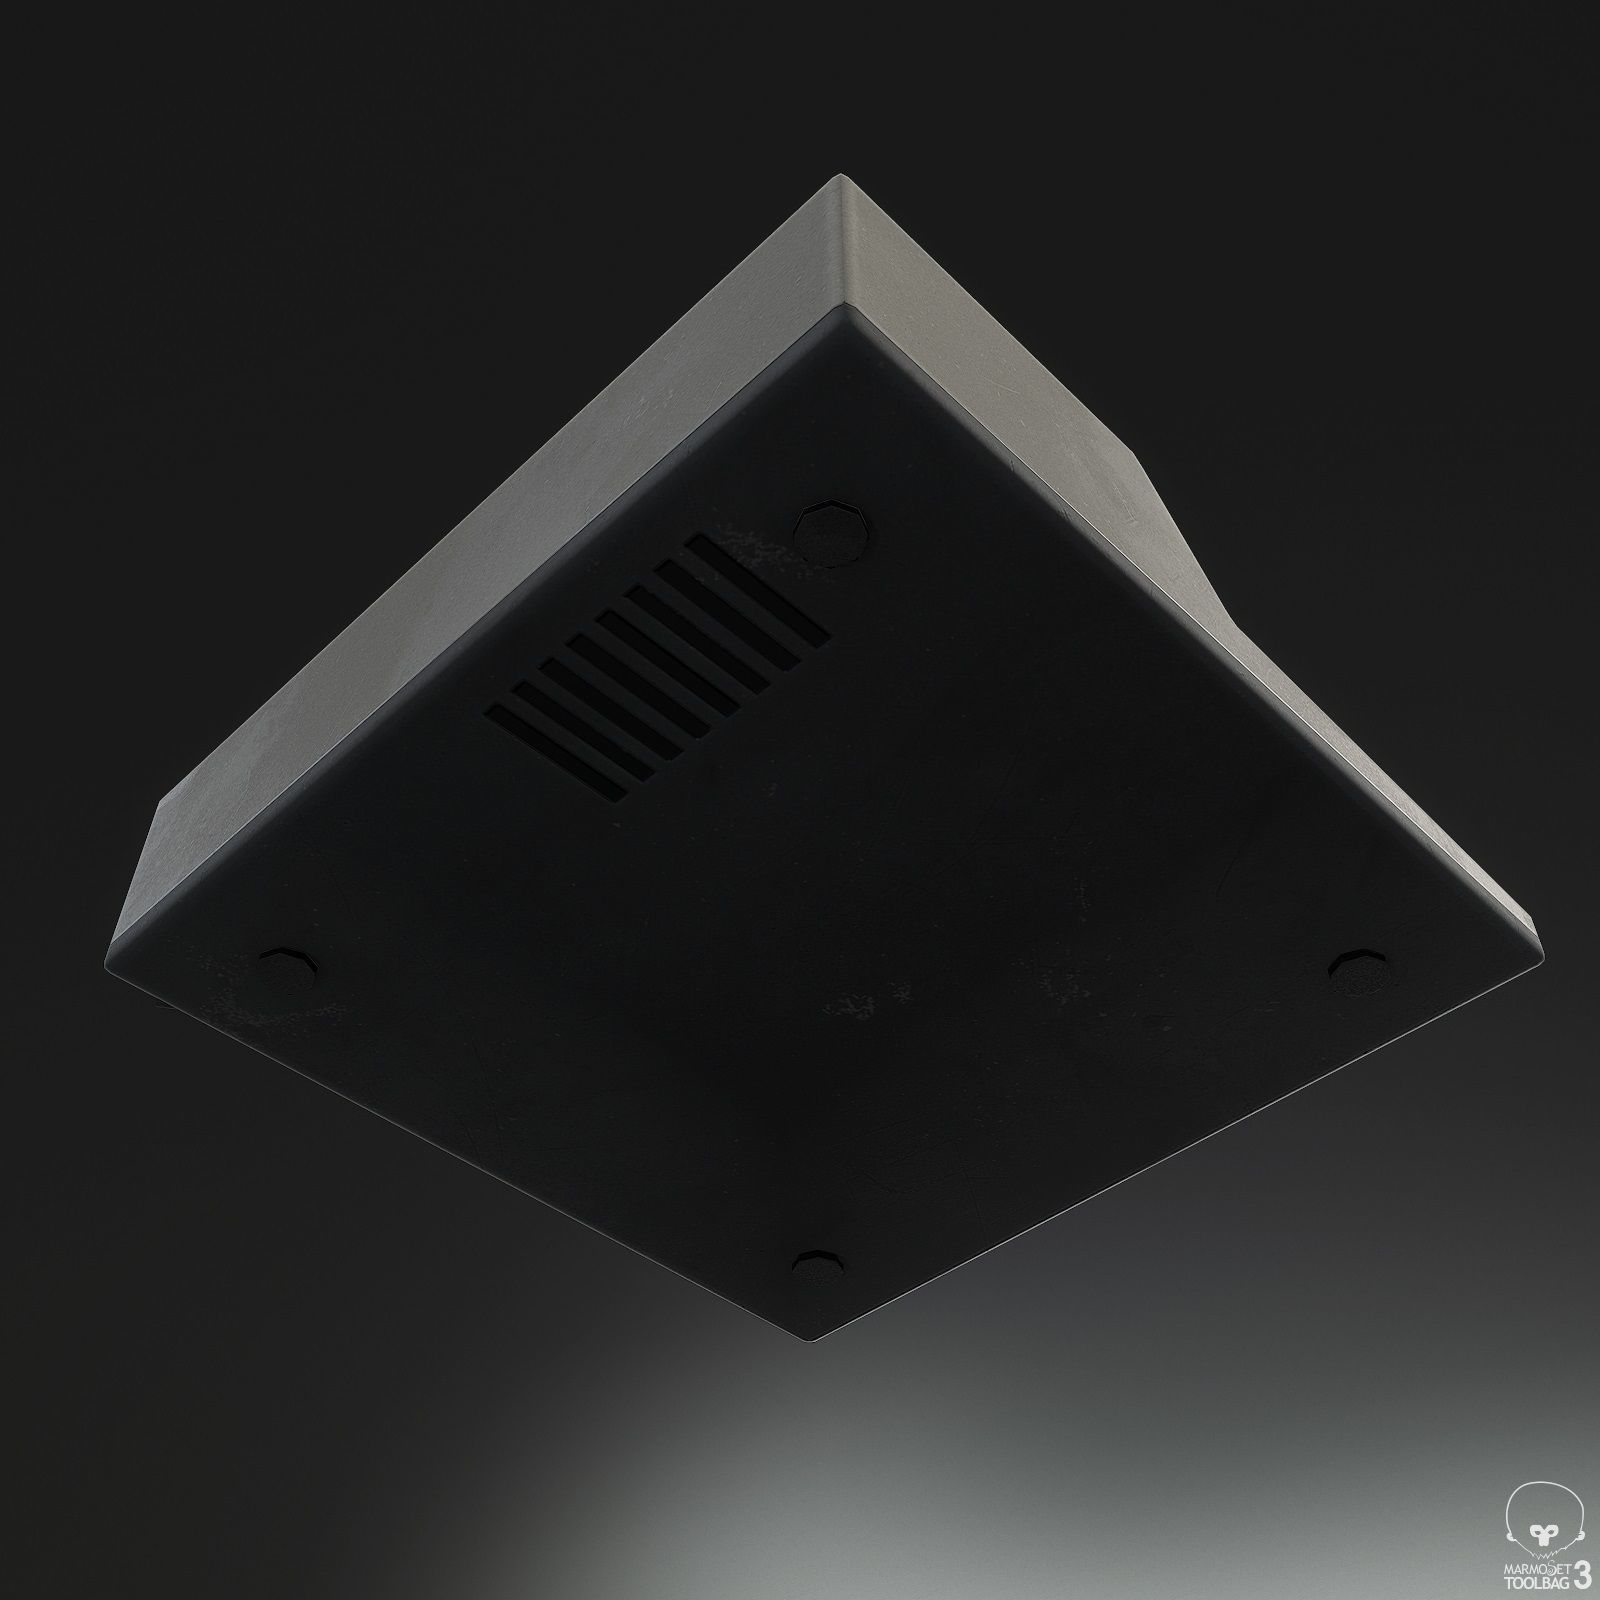 Acp ceiling max kit theteenline acp white vinyl ceiling grid surface mount kit pranksenders dailygadgetfo Choice Image